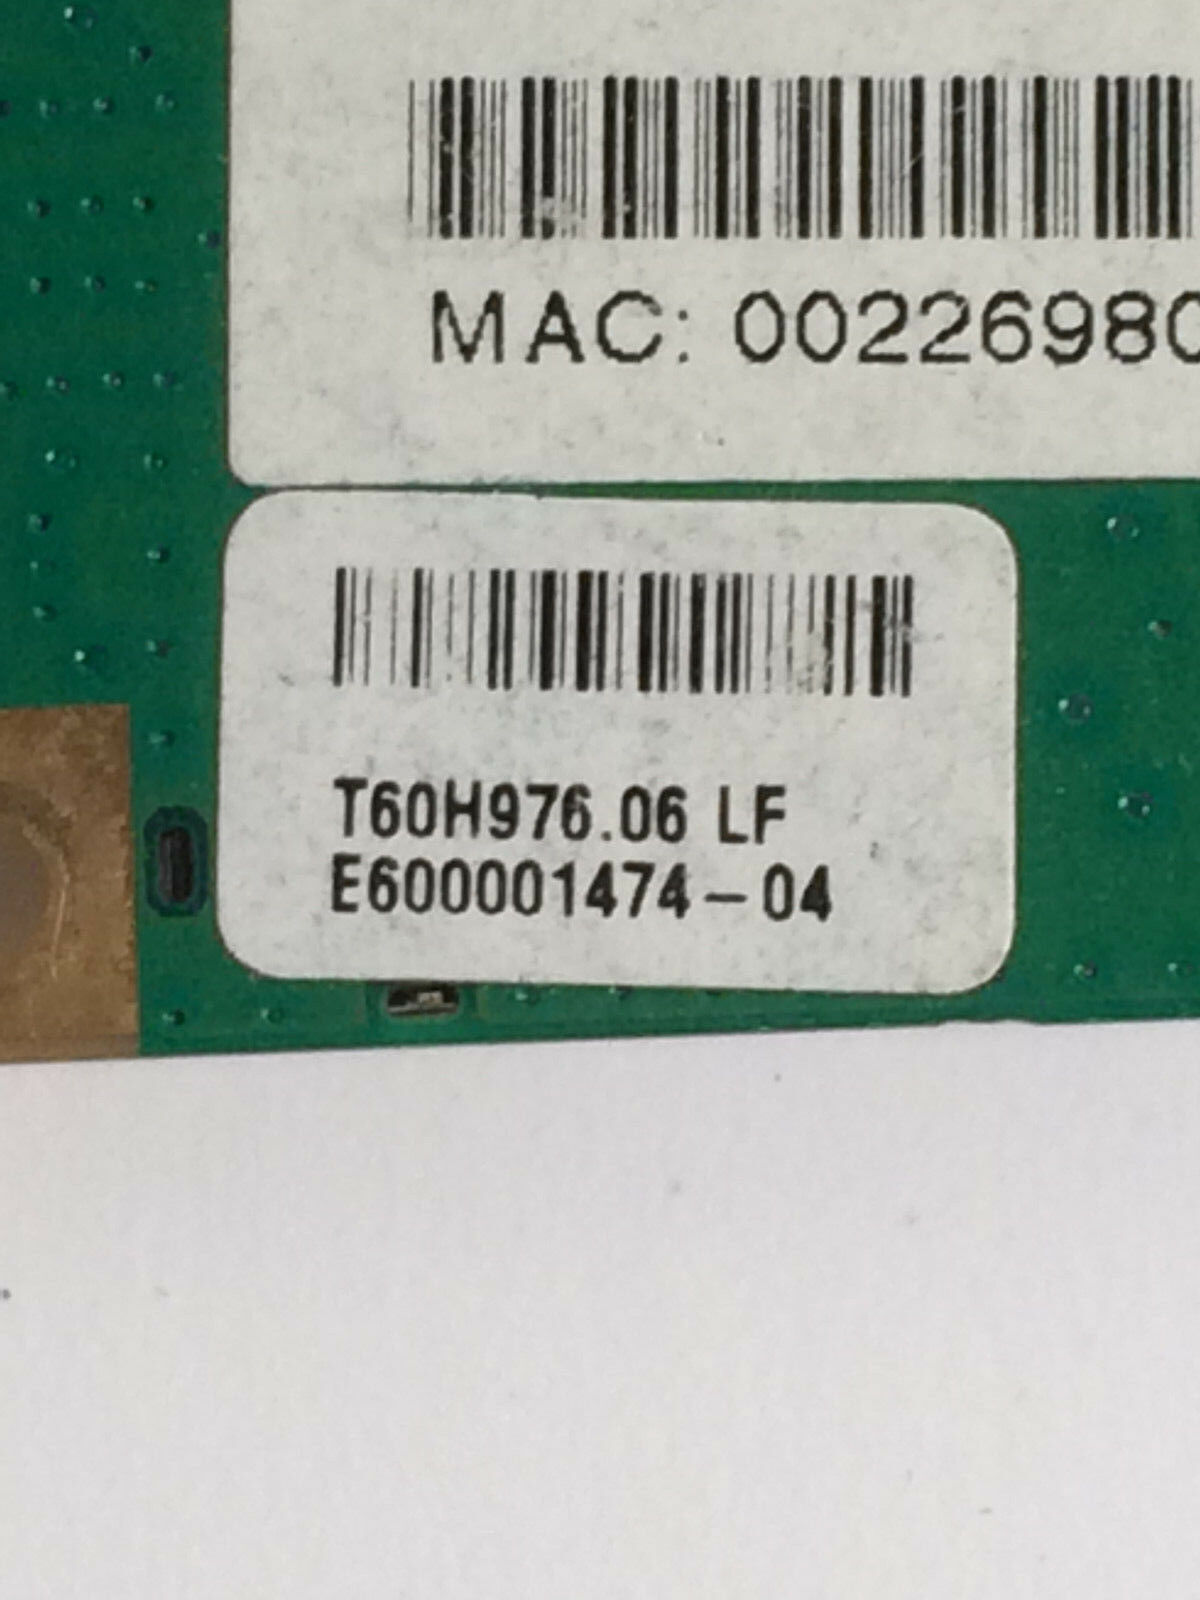 HP 459339-001 Pavilion dv6000 dv9000 g50 802.11b/g Mini PCI Wireless WI-FI Card image 5